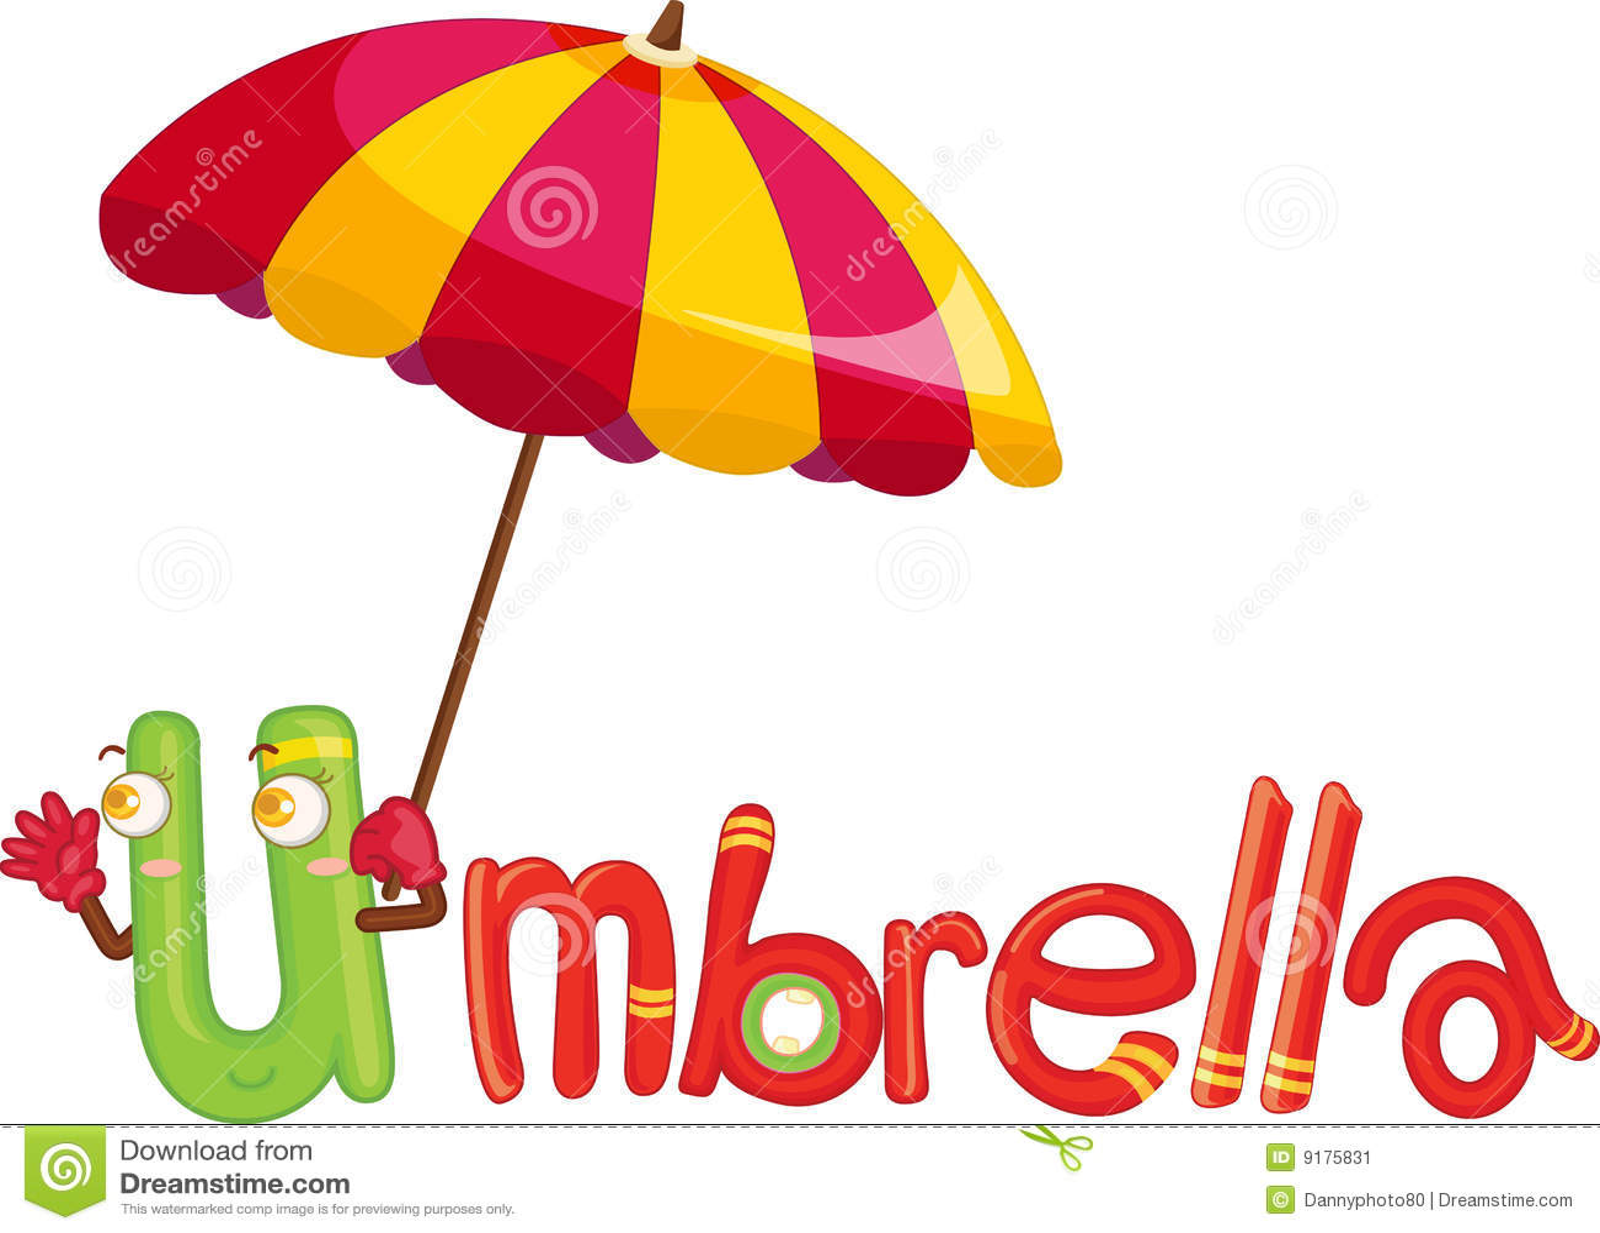 U For Umbrella Stock Illustration Illustration Of Drawing